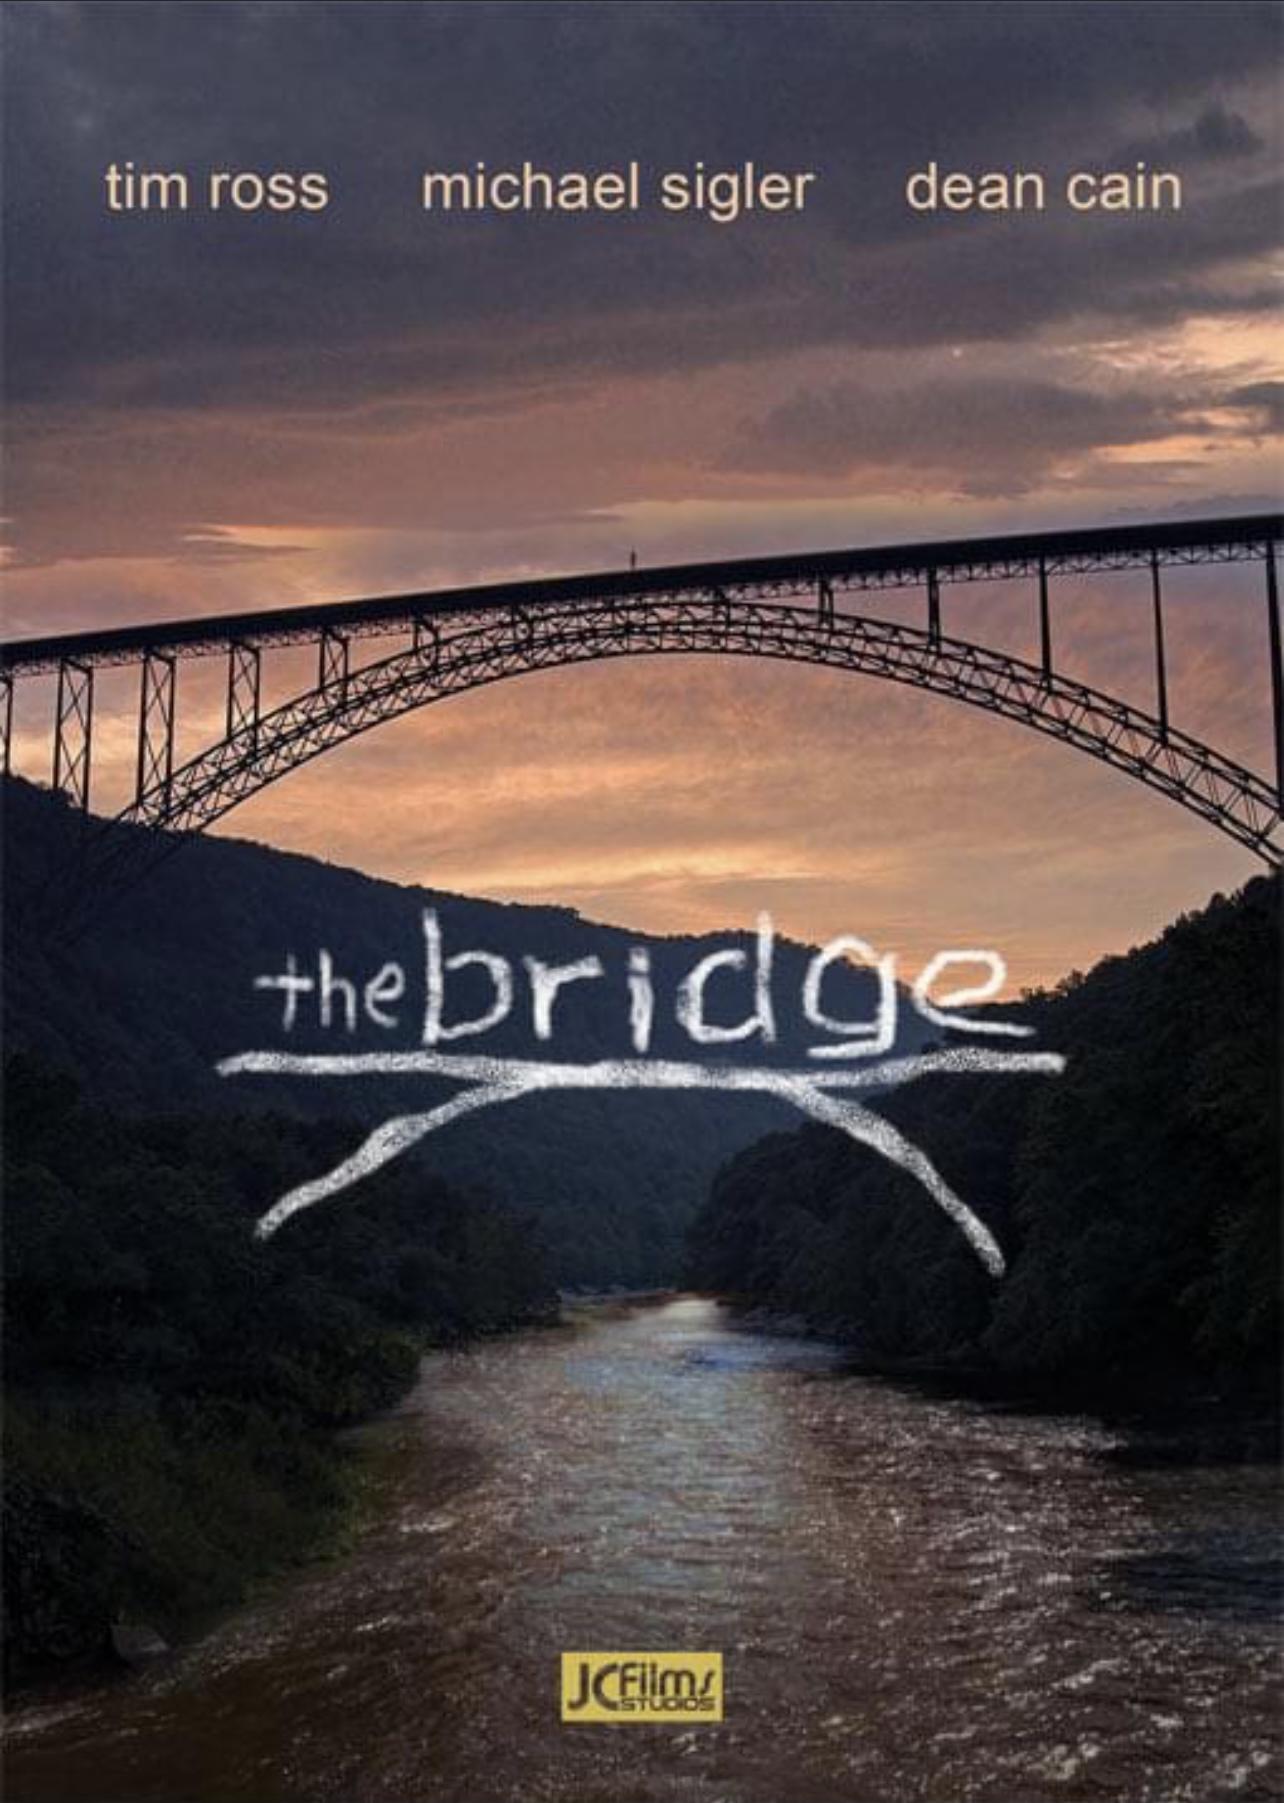 The Bridge (2021) Hindi (Voice Over) Dubbed+ English [Dual Audio] WebRip 720p [1XBET]